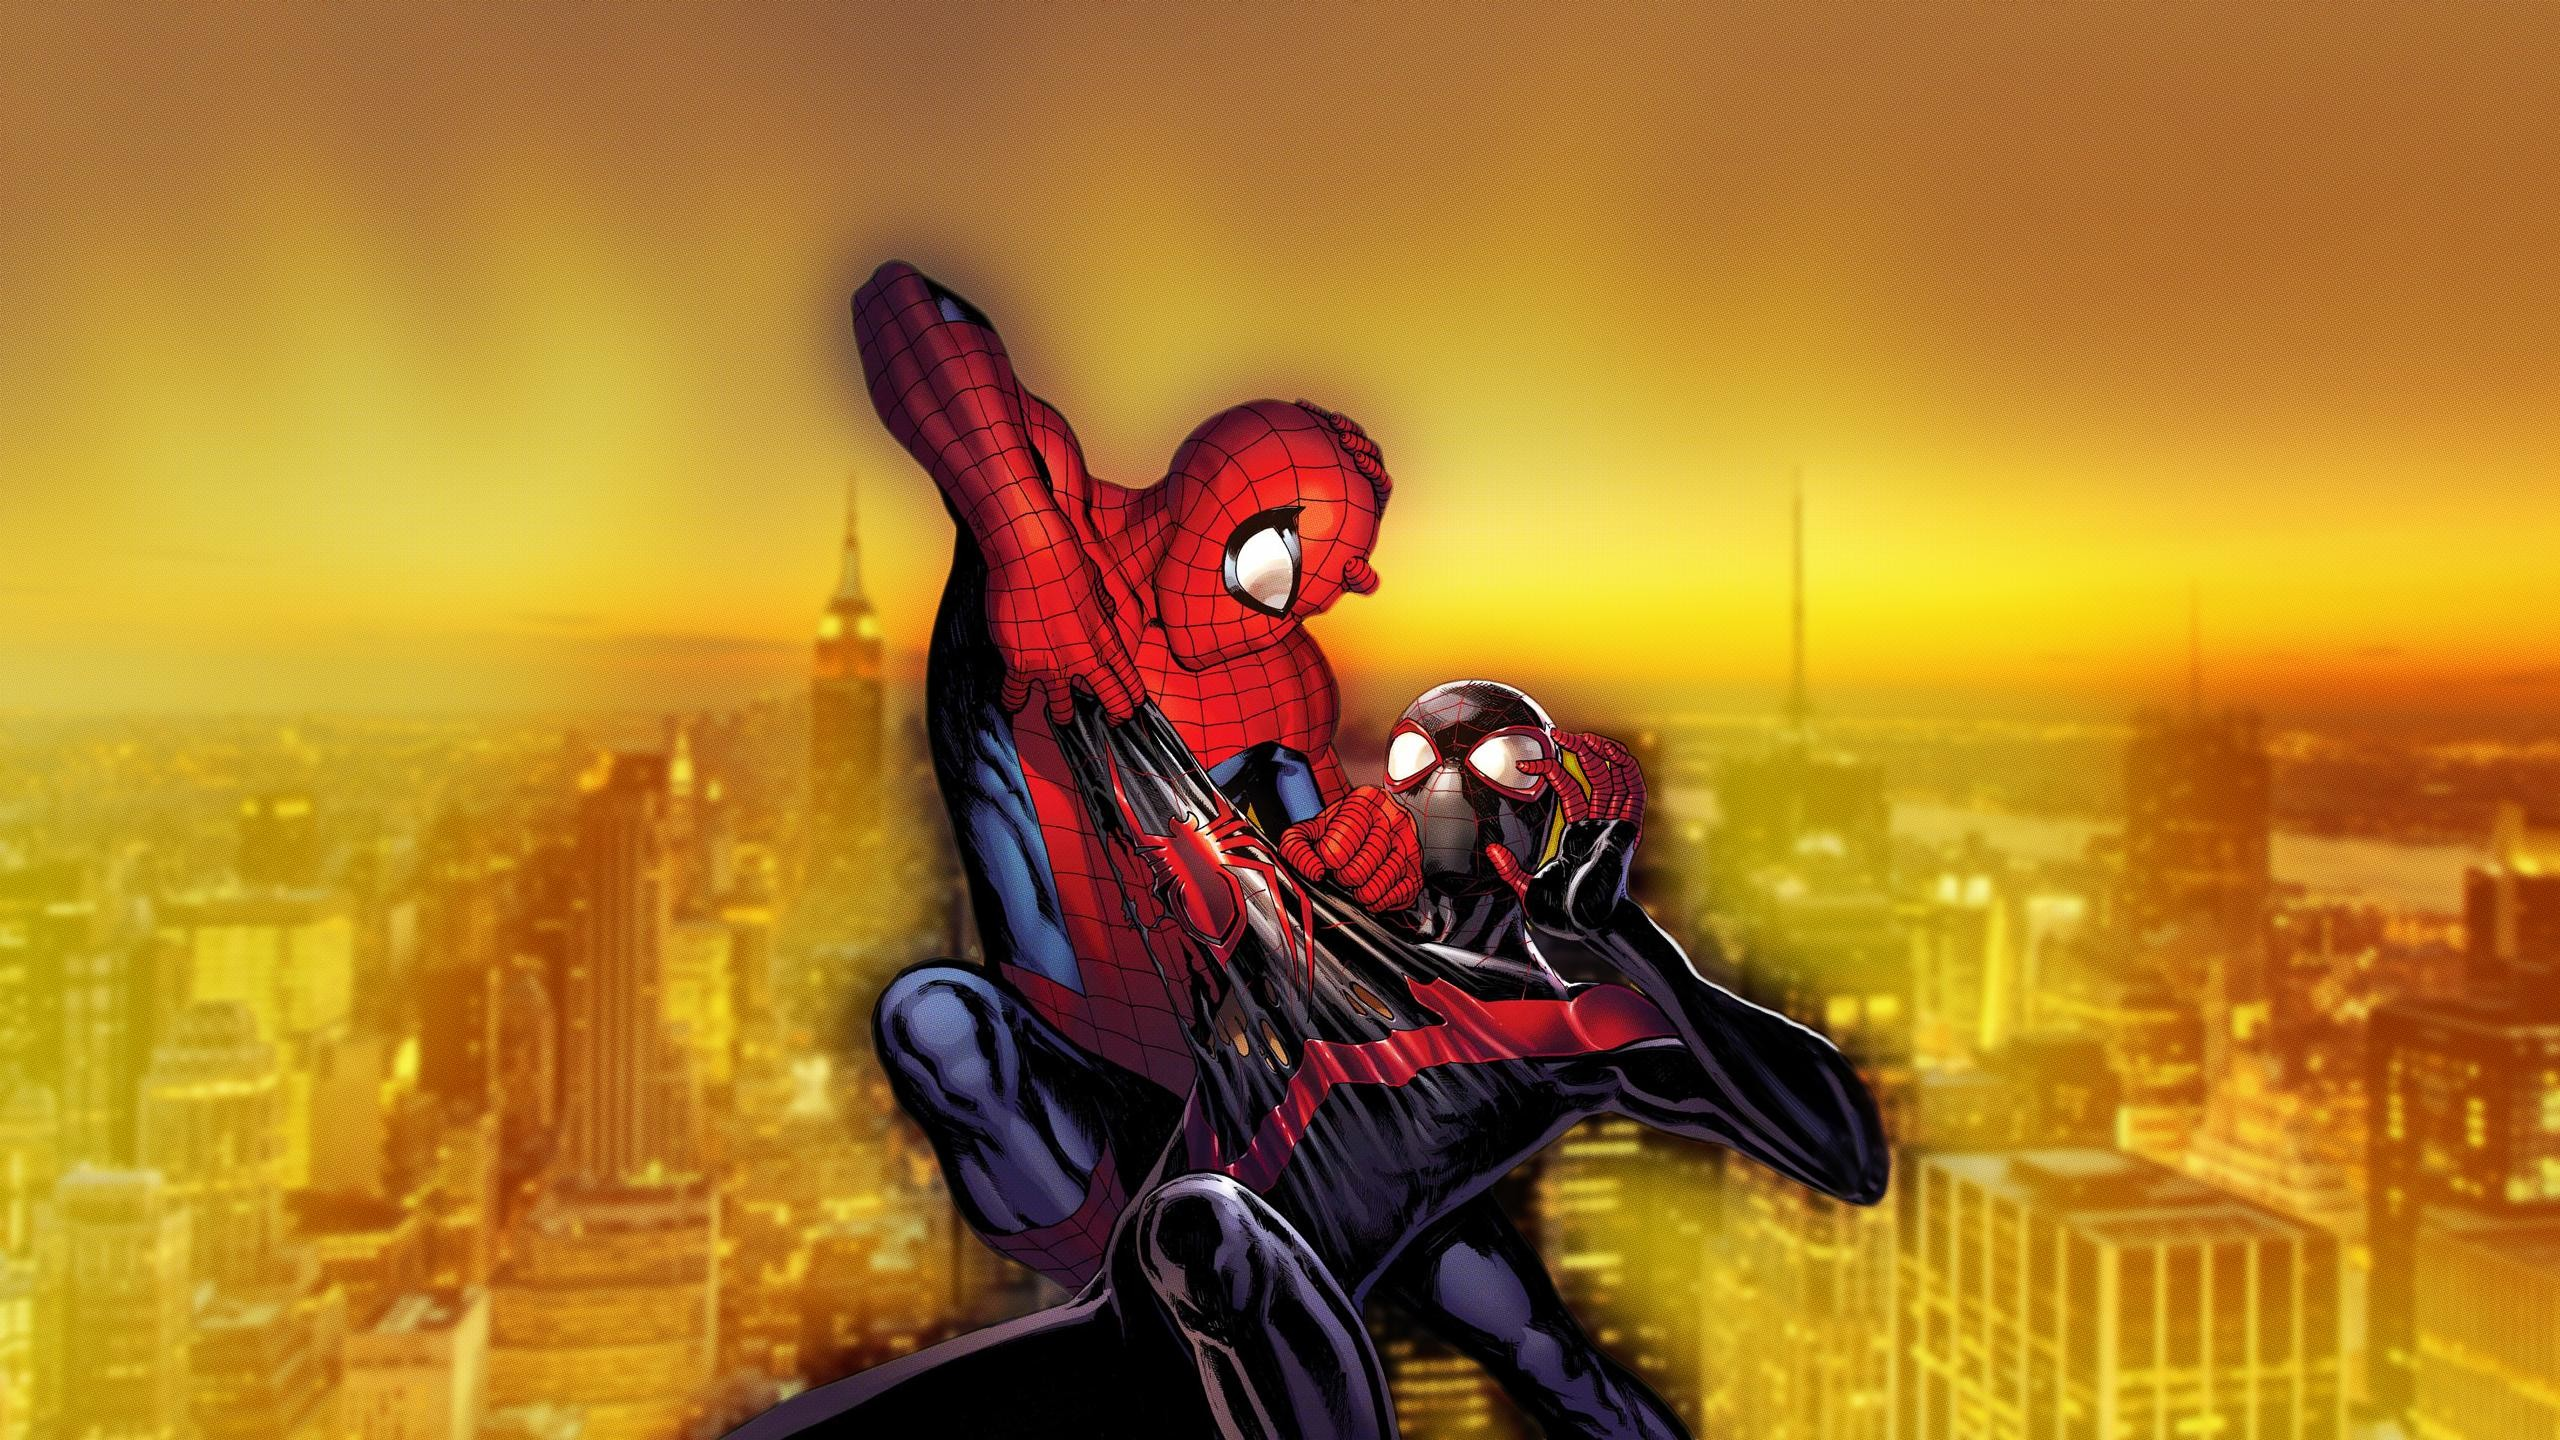 [1440p] Spiderman & Spiderman Wallpaper …